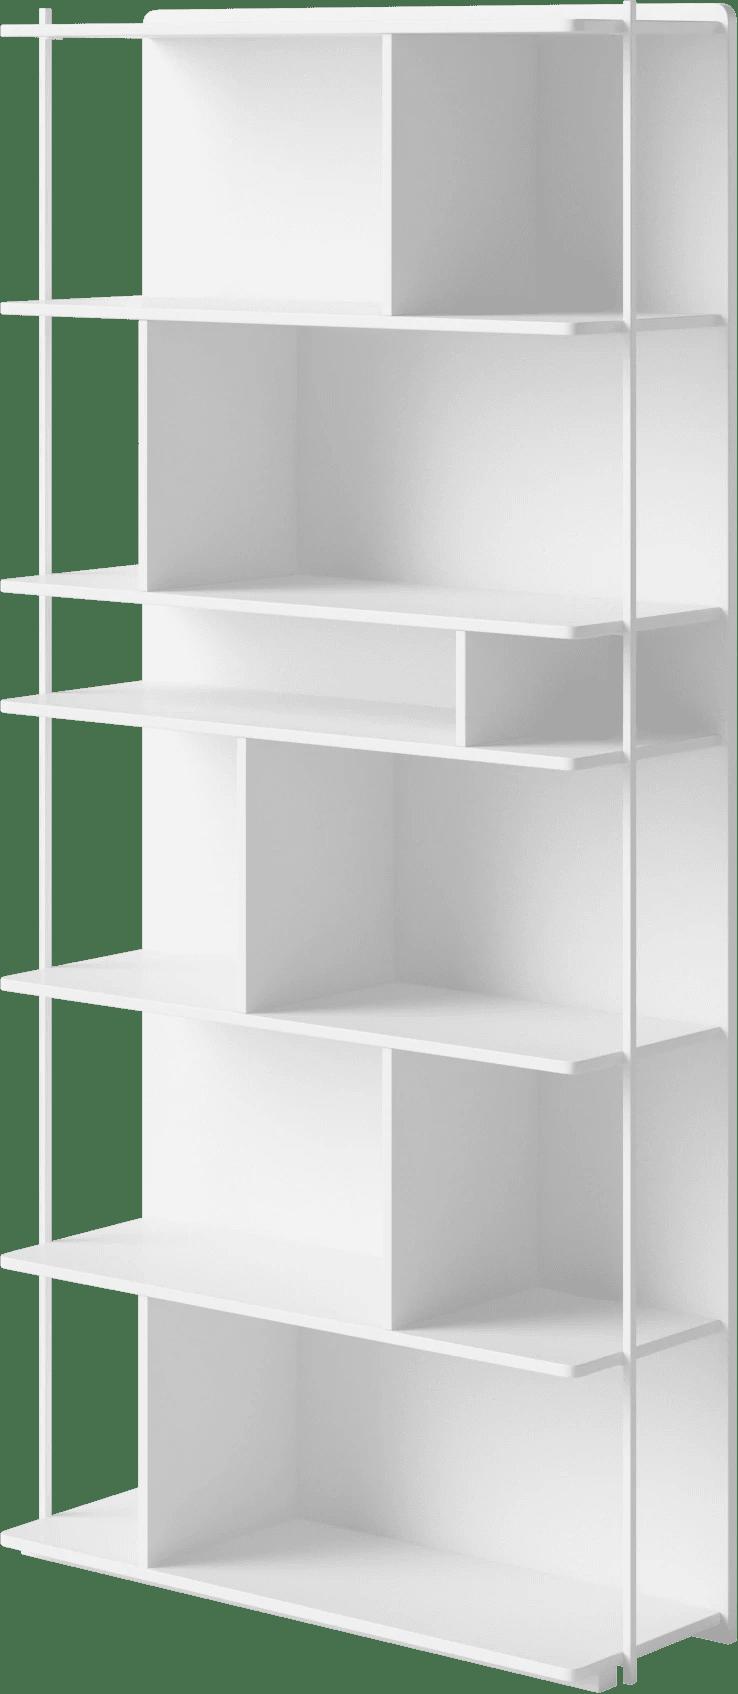 bolia_structure_rack_low_polc_polcrendszer_living_room_furniture_nappali_butor_MDF_innoconcept_design_furniture_desing_butor_02